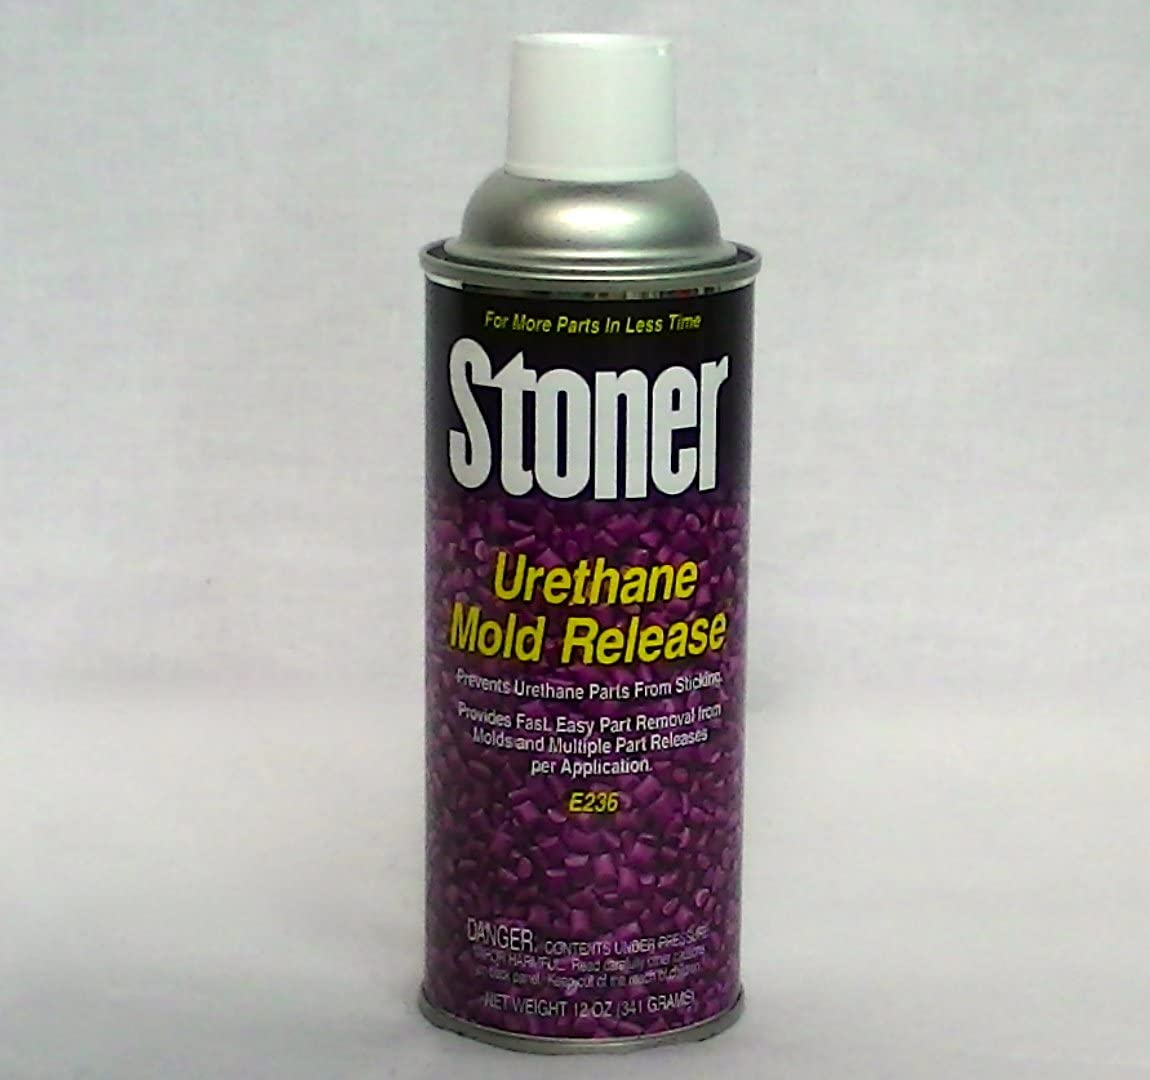 Stoner E-236 Urethan Mold Release 1 - 12 oz can